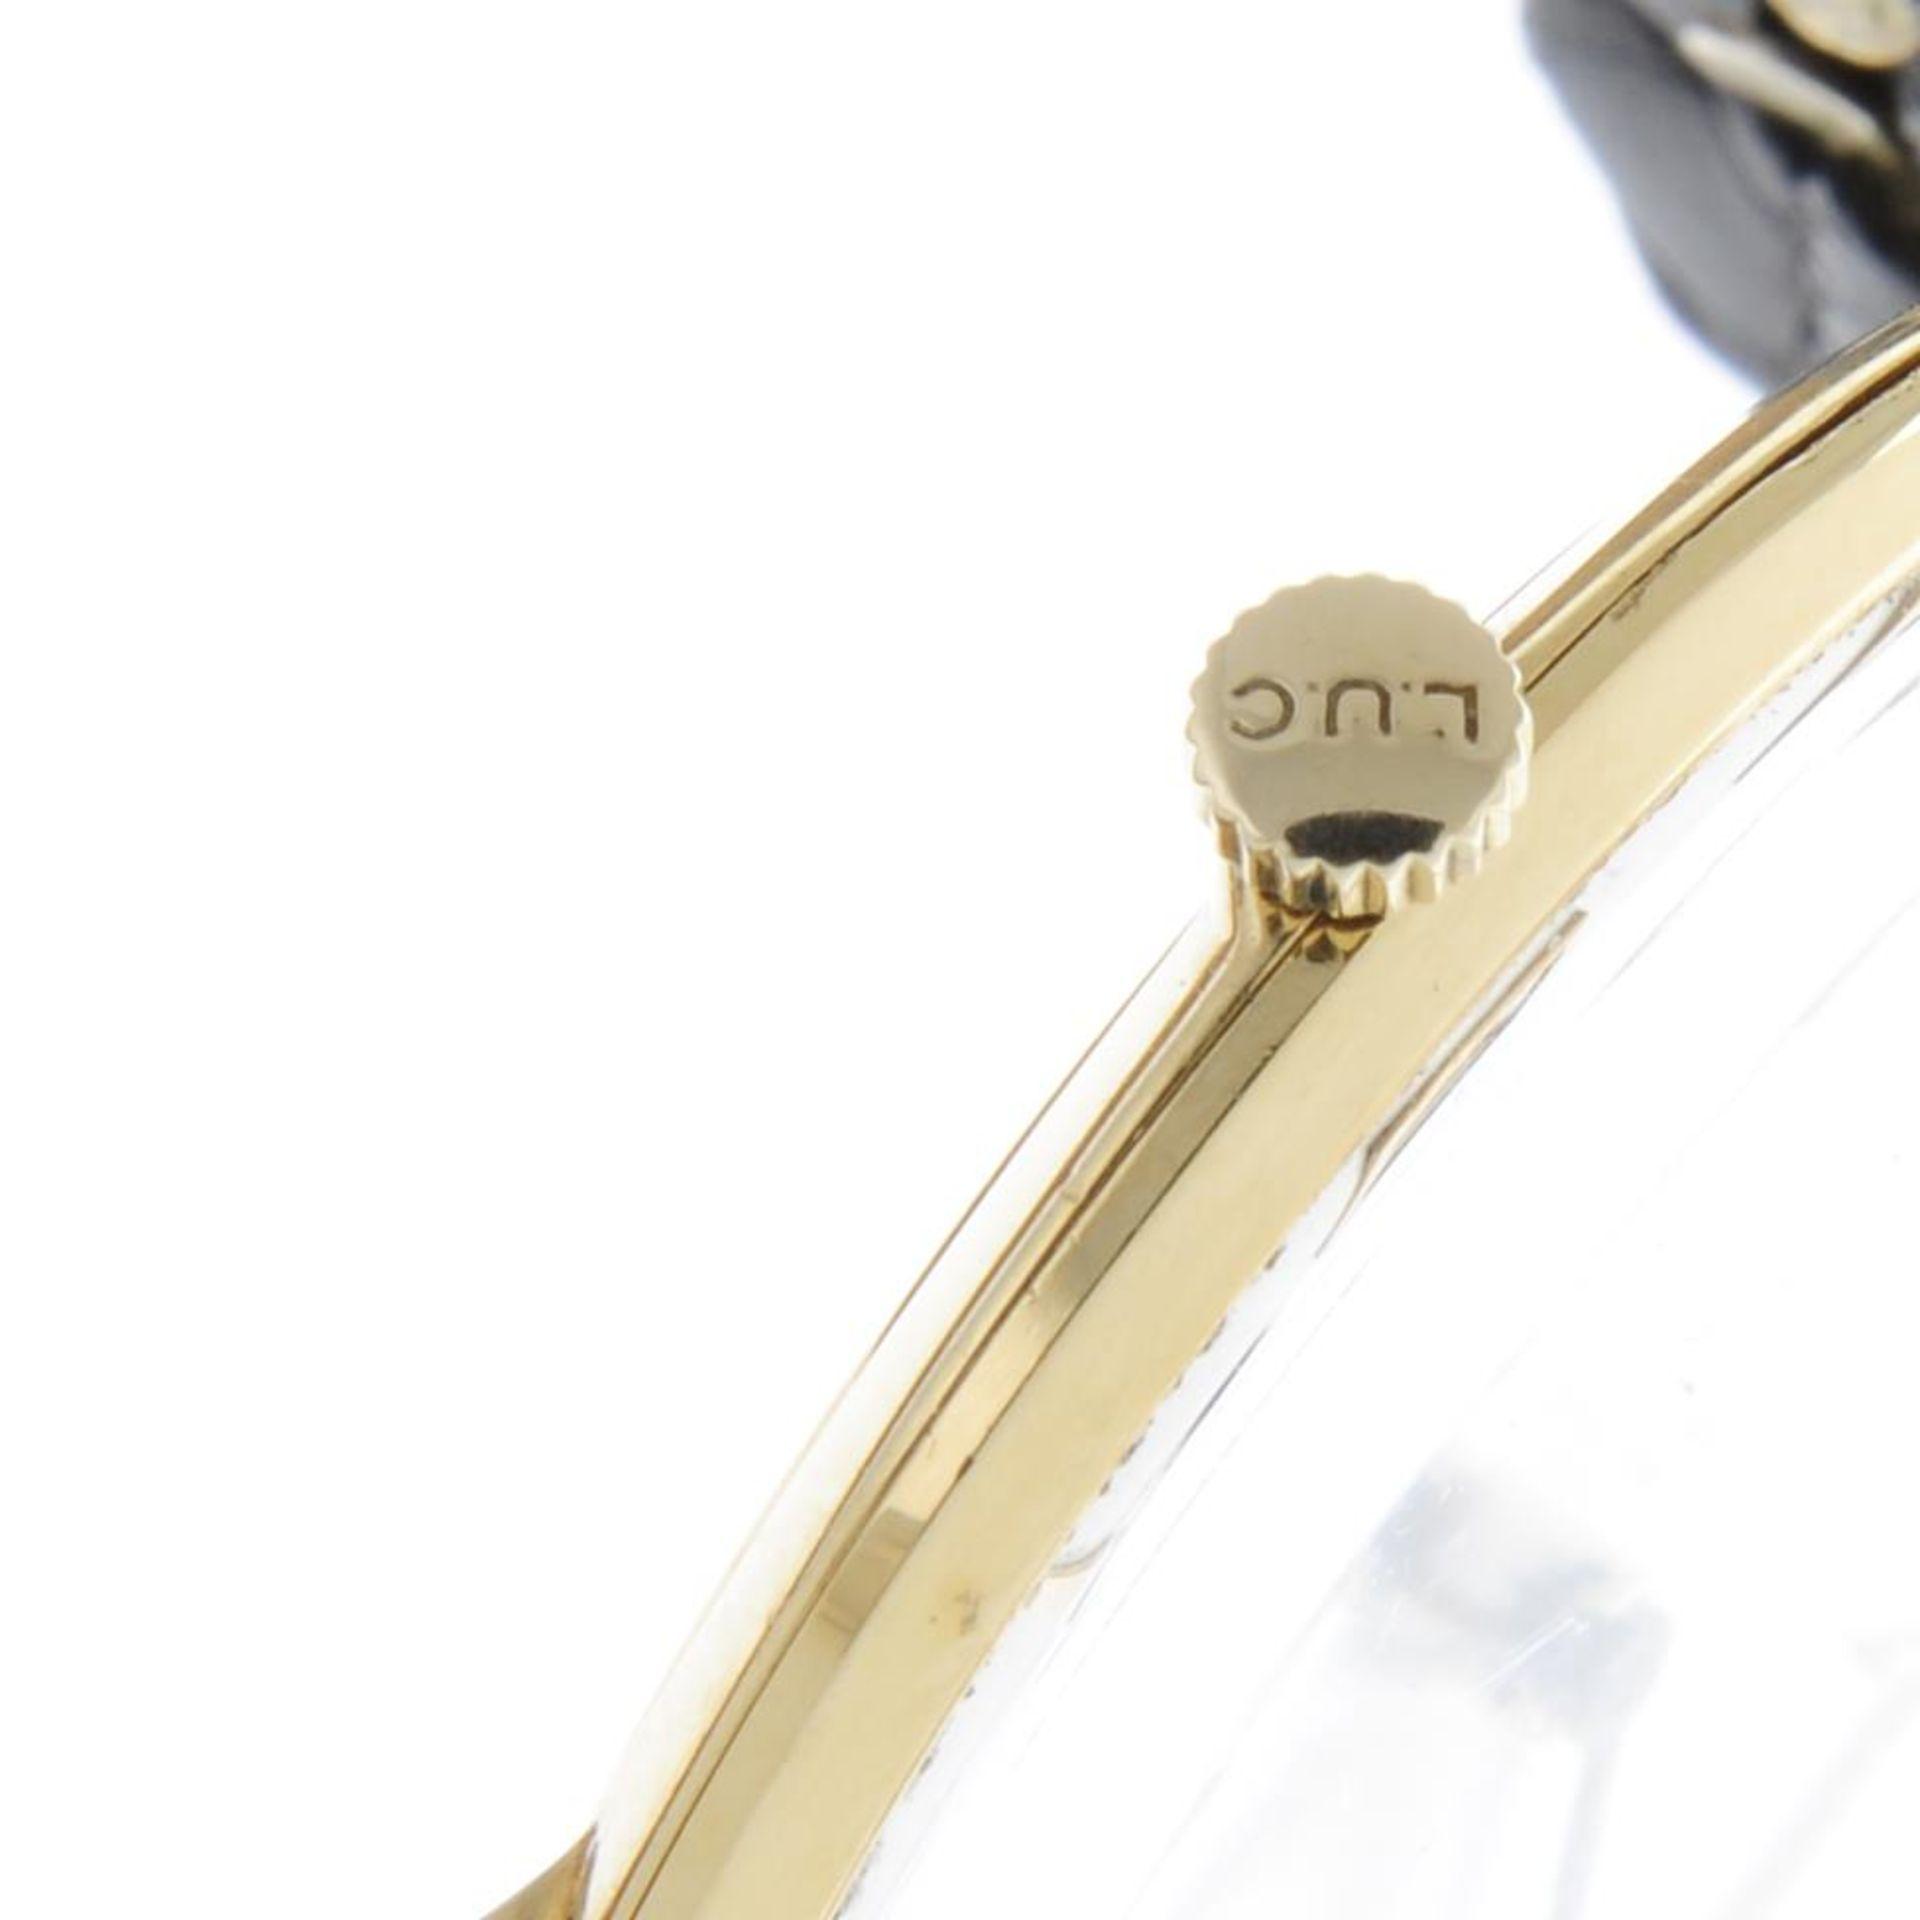 CHOPARD - a wrist watch. - Bild 4 aus 5